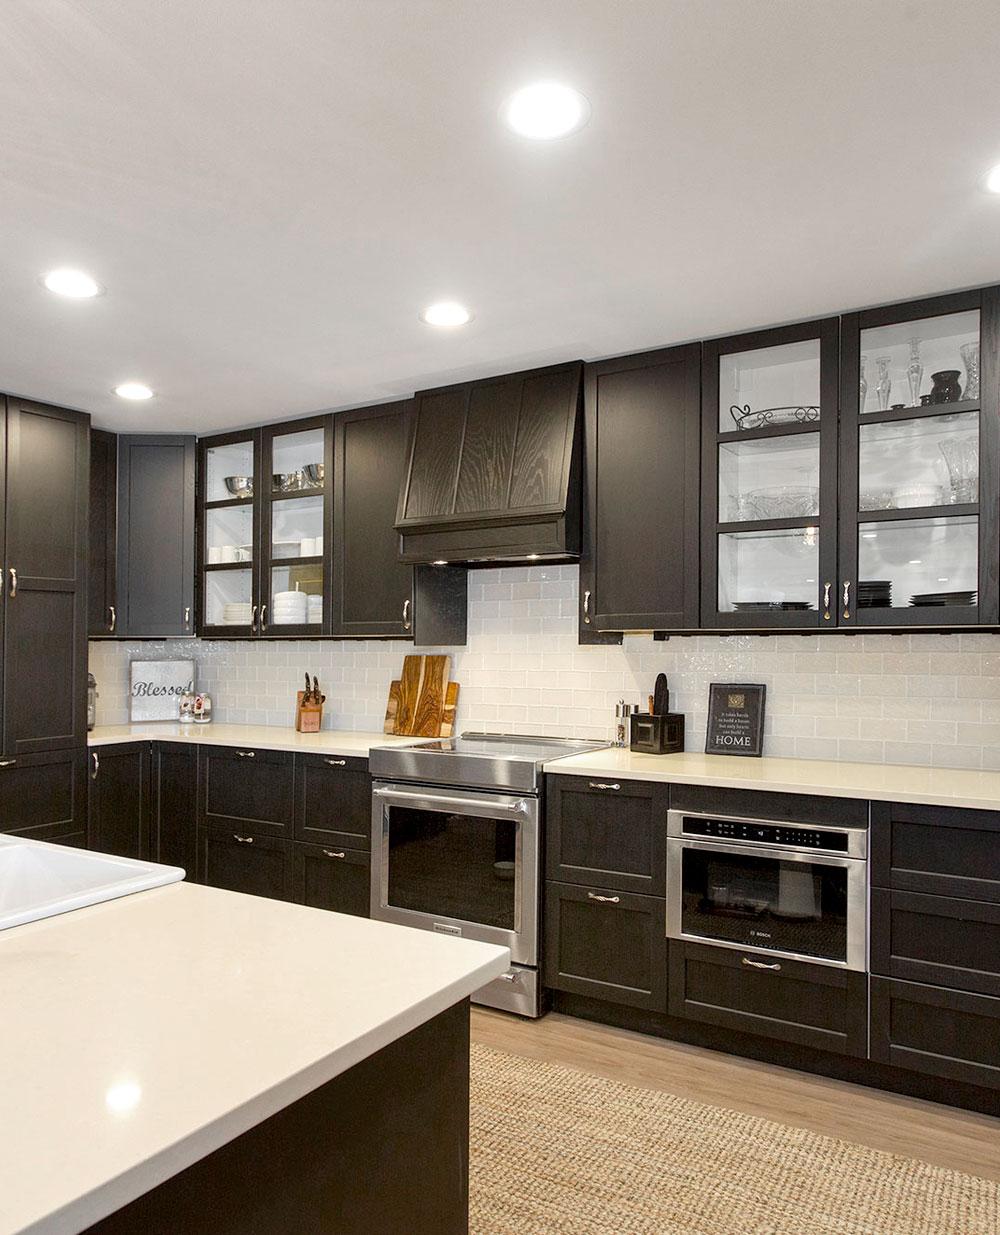 Rustic Lodge Kitchen Subway Tile Backsplash